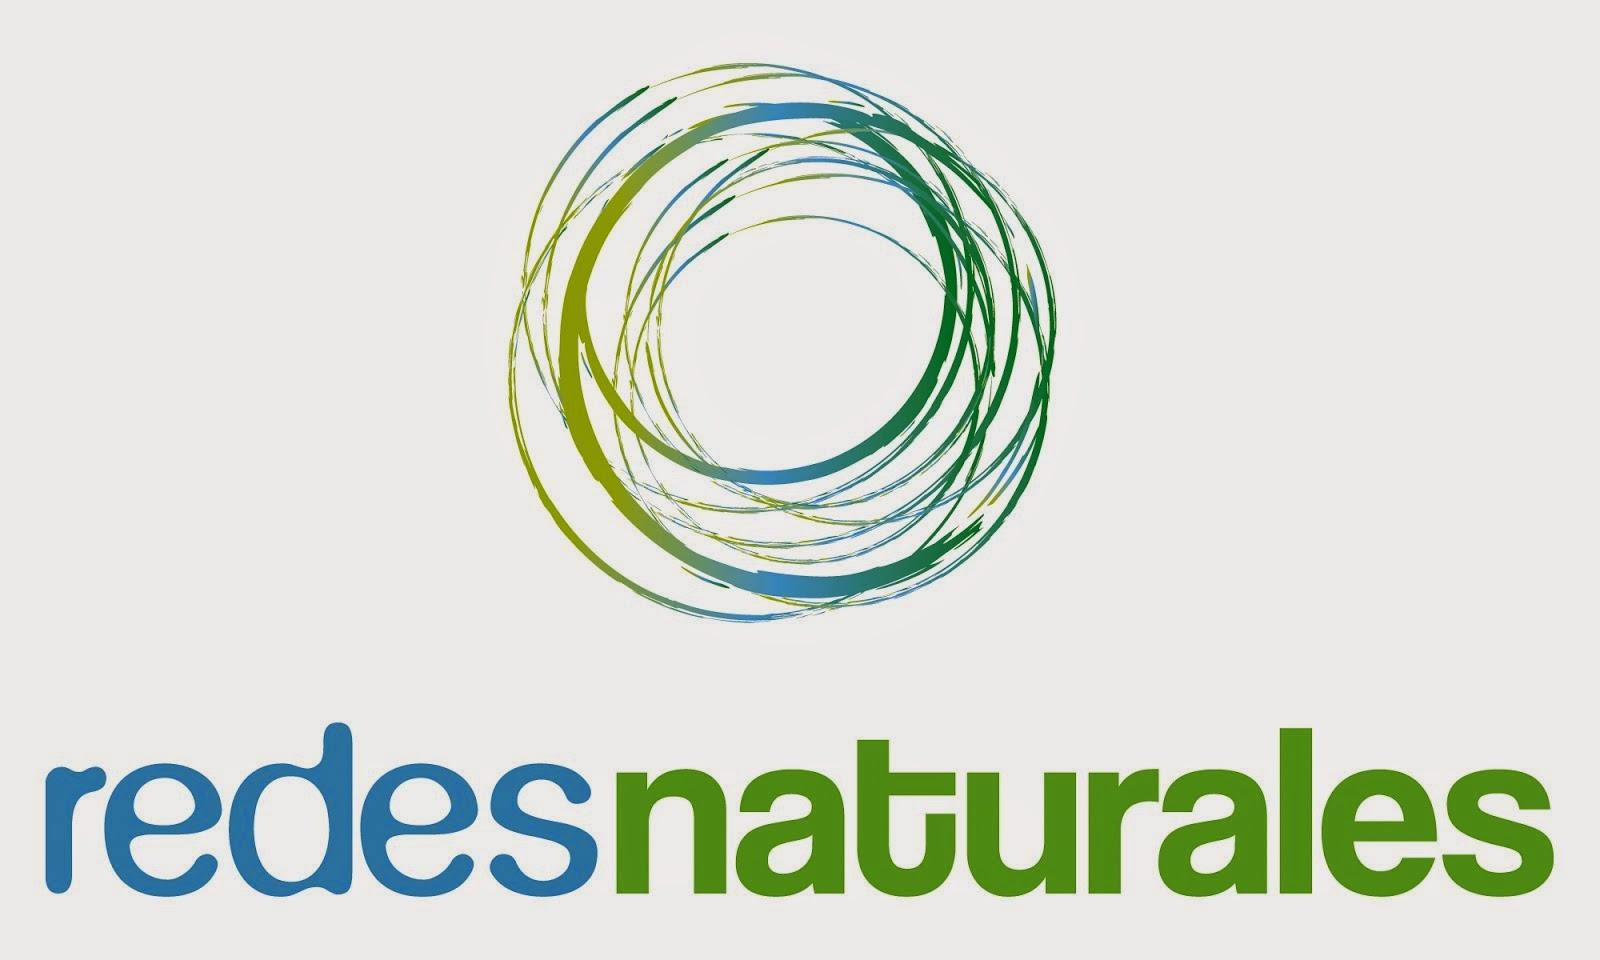 Redes naturales Amynes